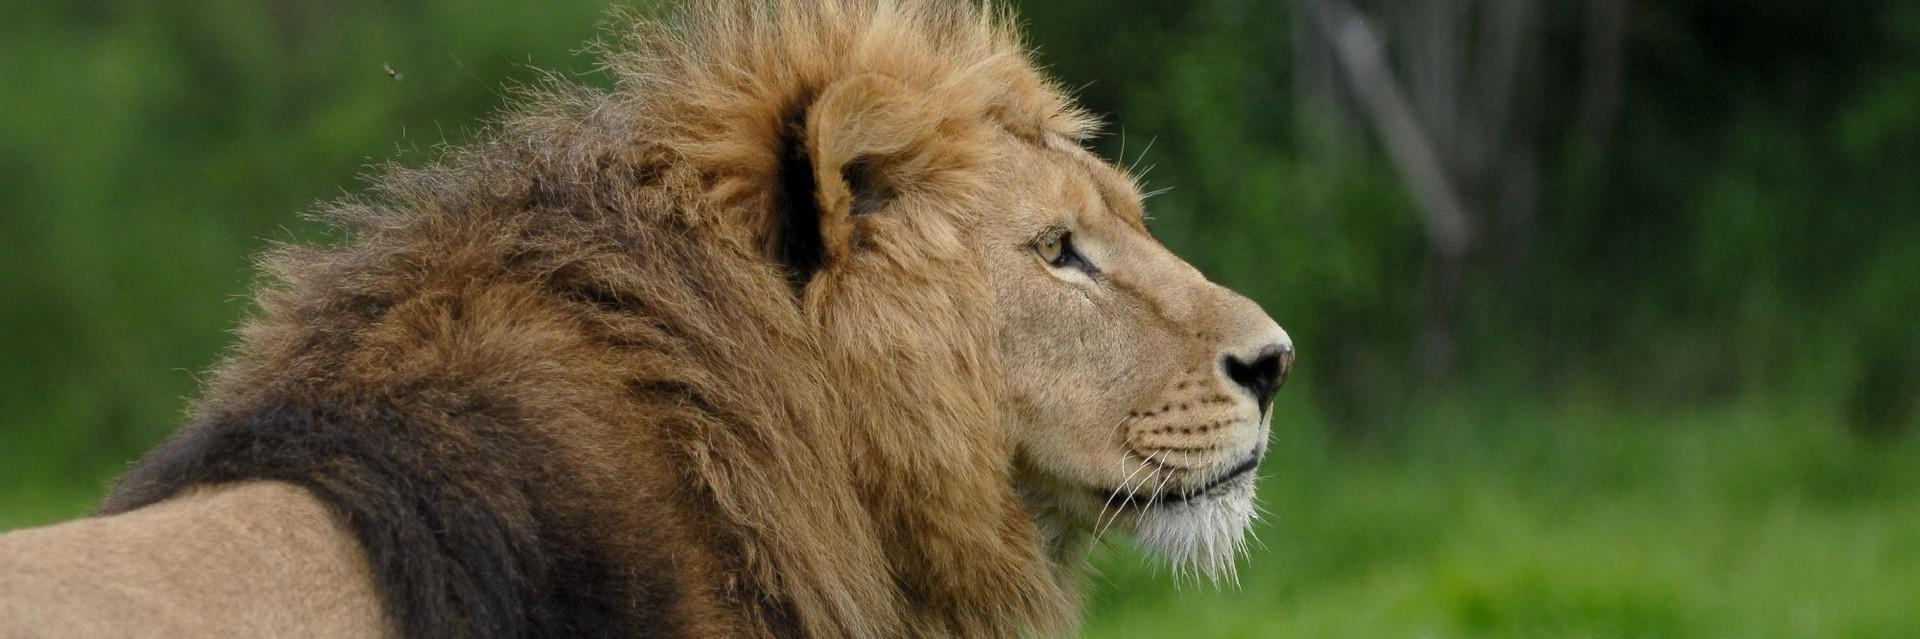 Lion in LIONSROCK